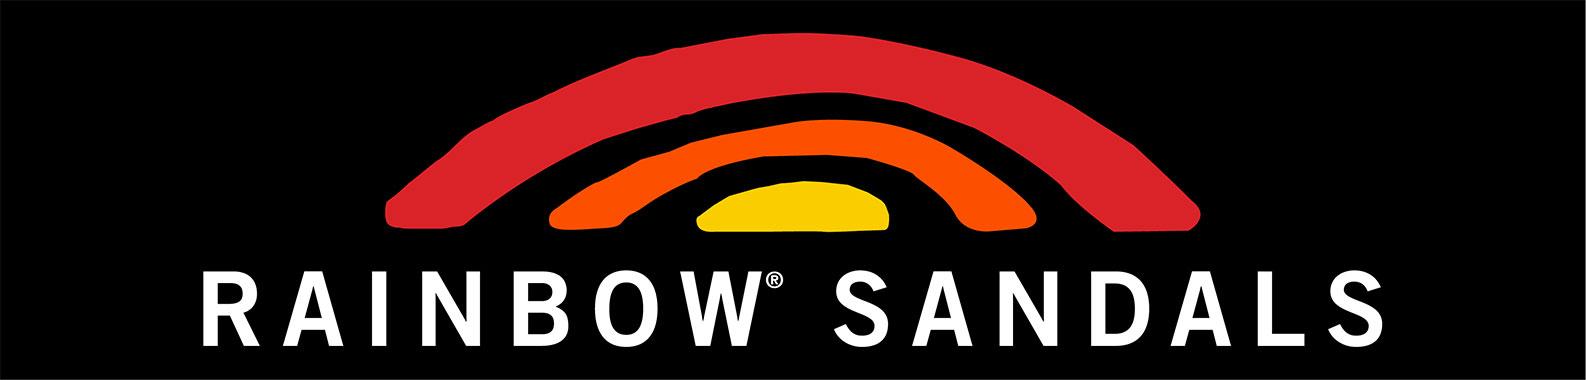 Rainbow brand header image